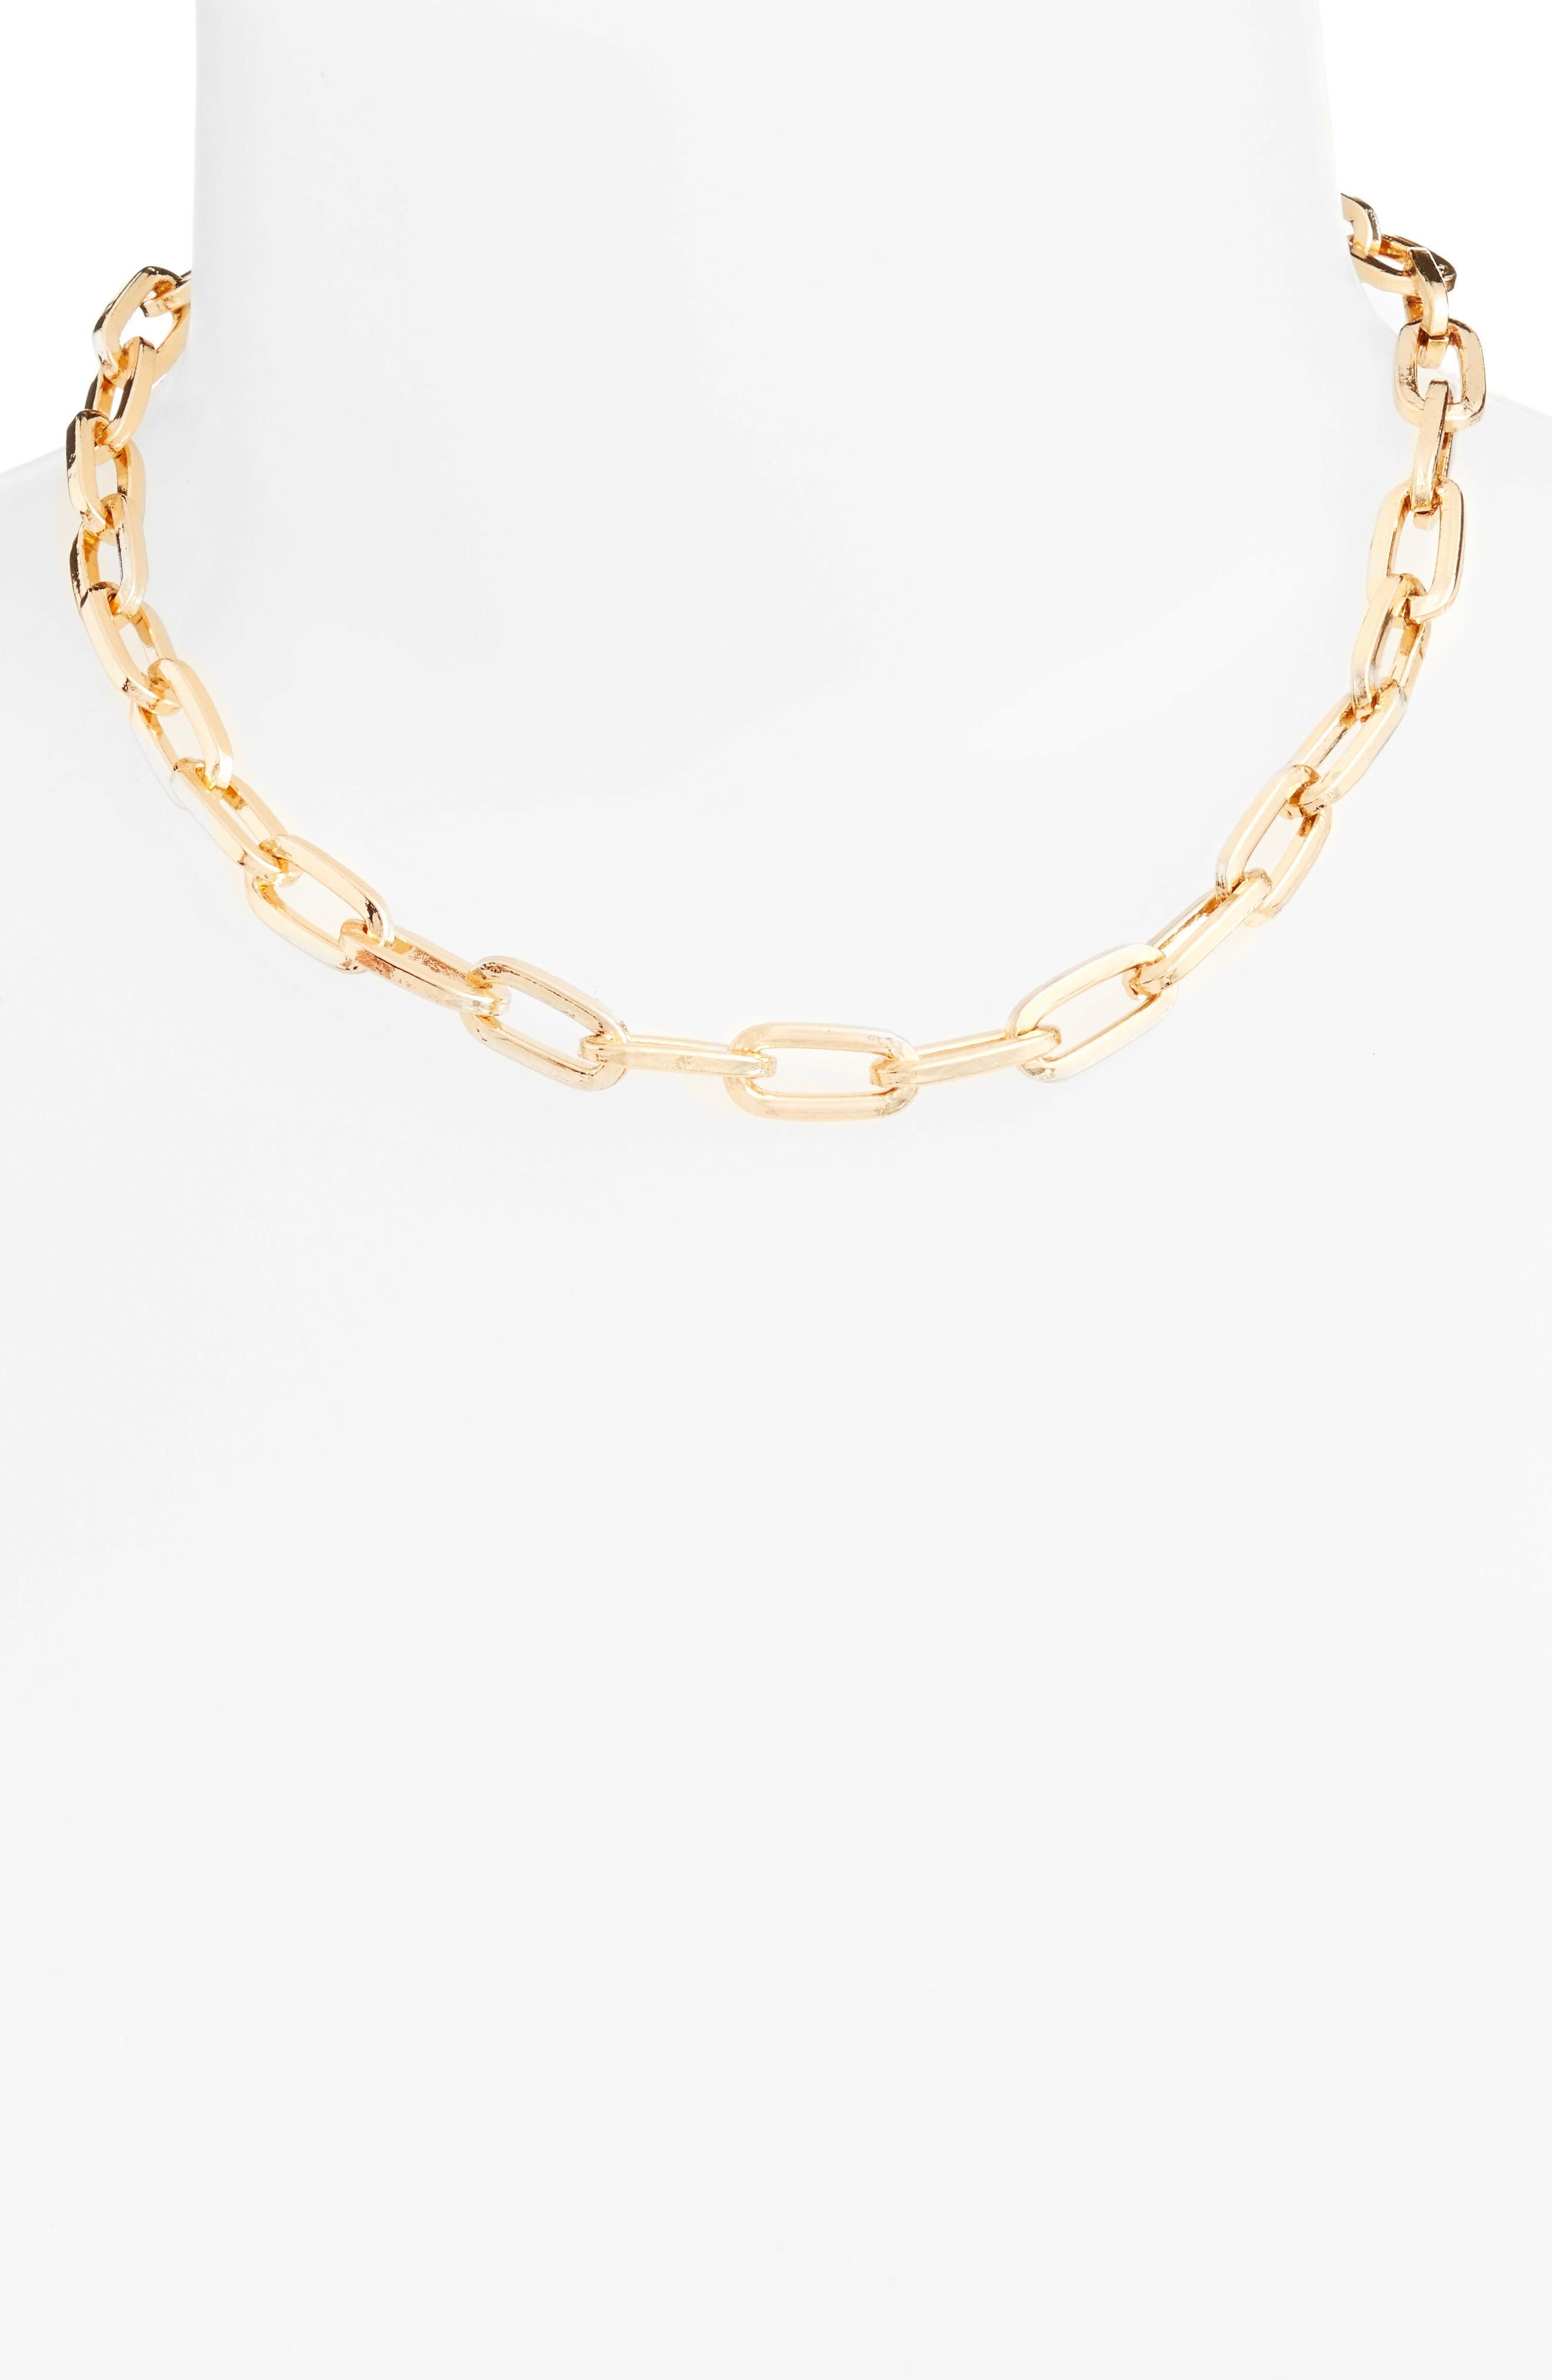 REBECCA MINKOFF Signature Link Necklace